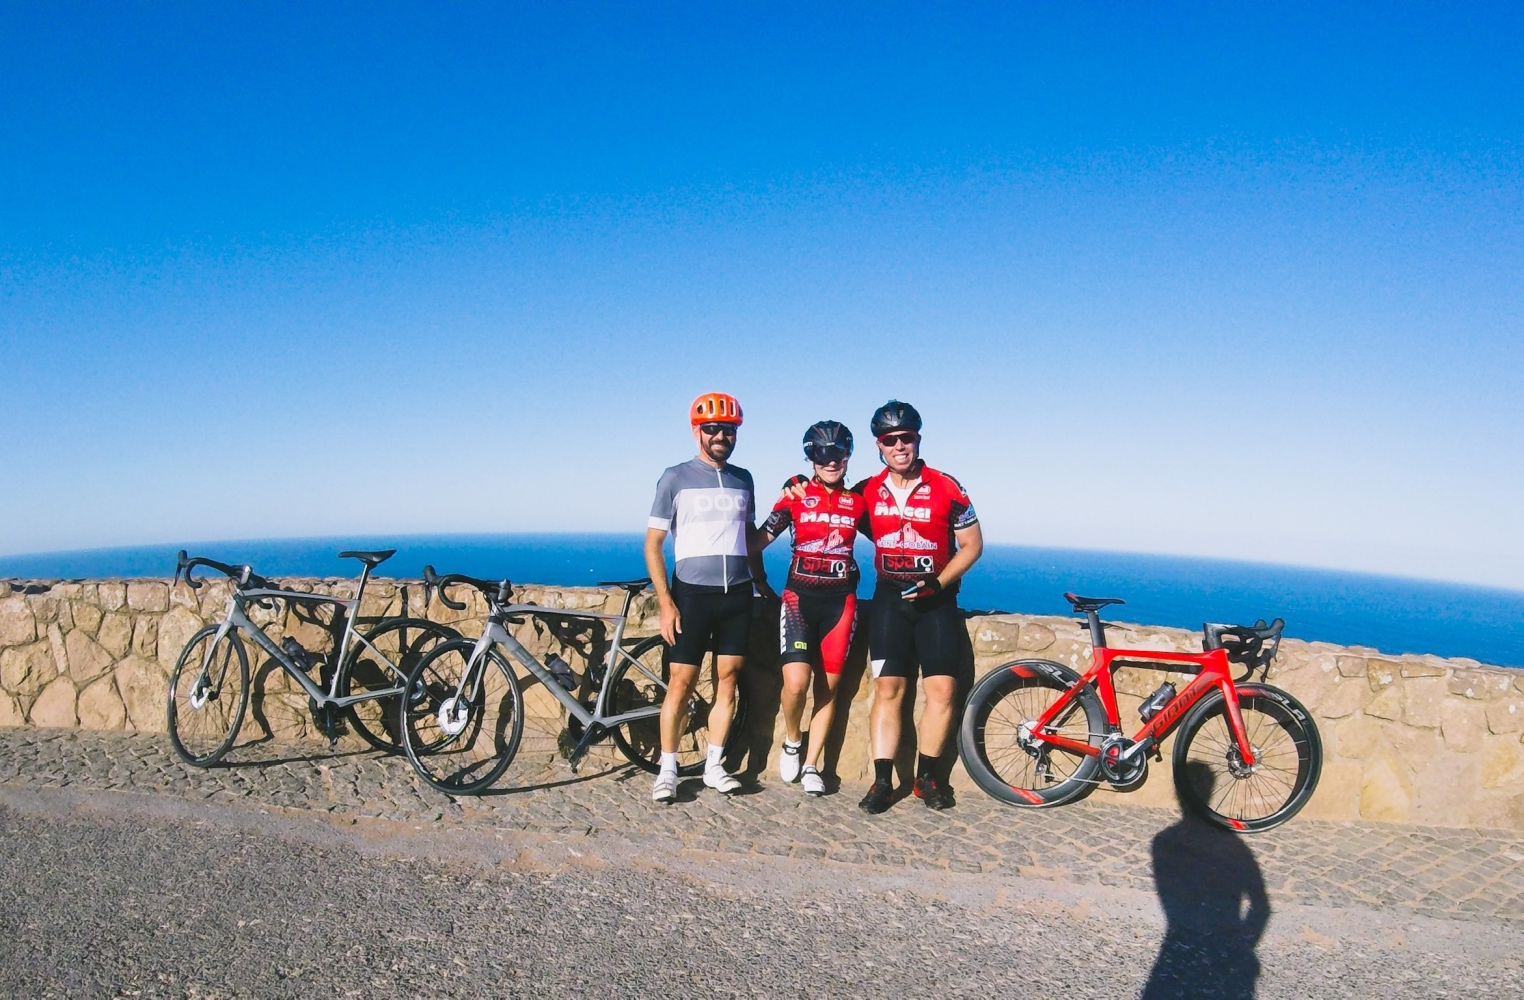 Road_Cycling_ Rentals_ Sintra_Cascais1_Fotor.jpg